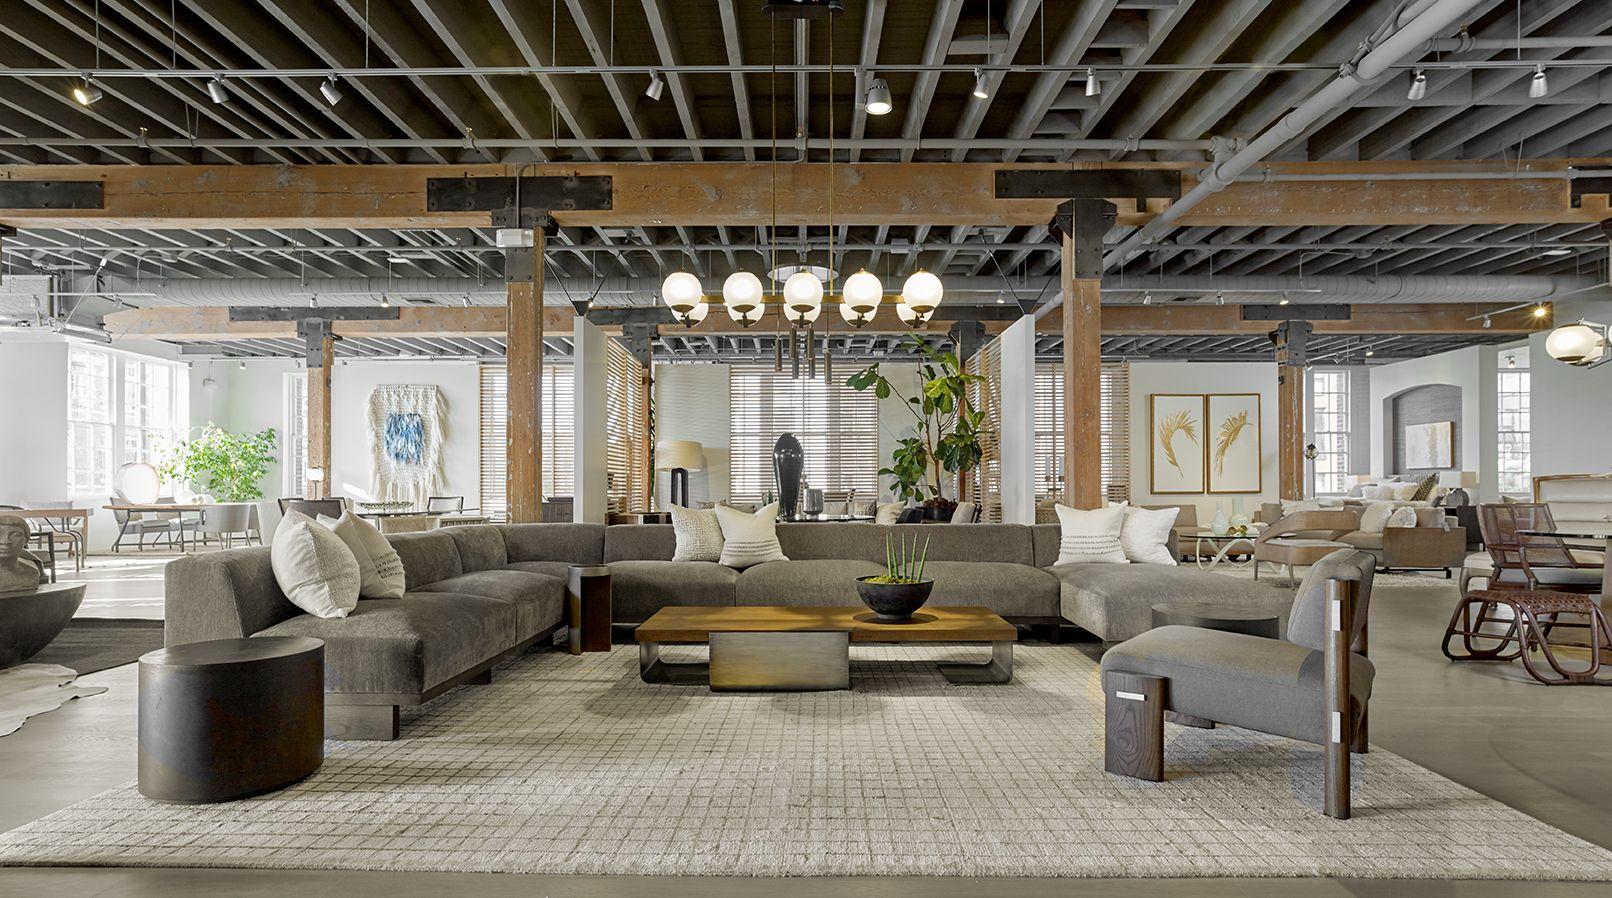 Mcguire furnitures new san francisco showroom opened in september 2018